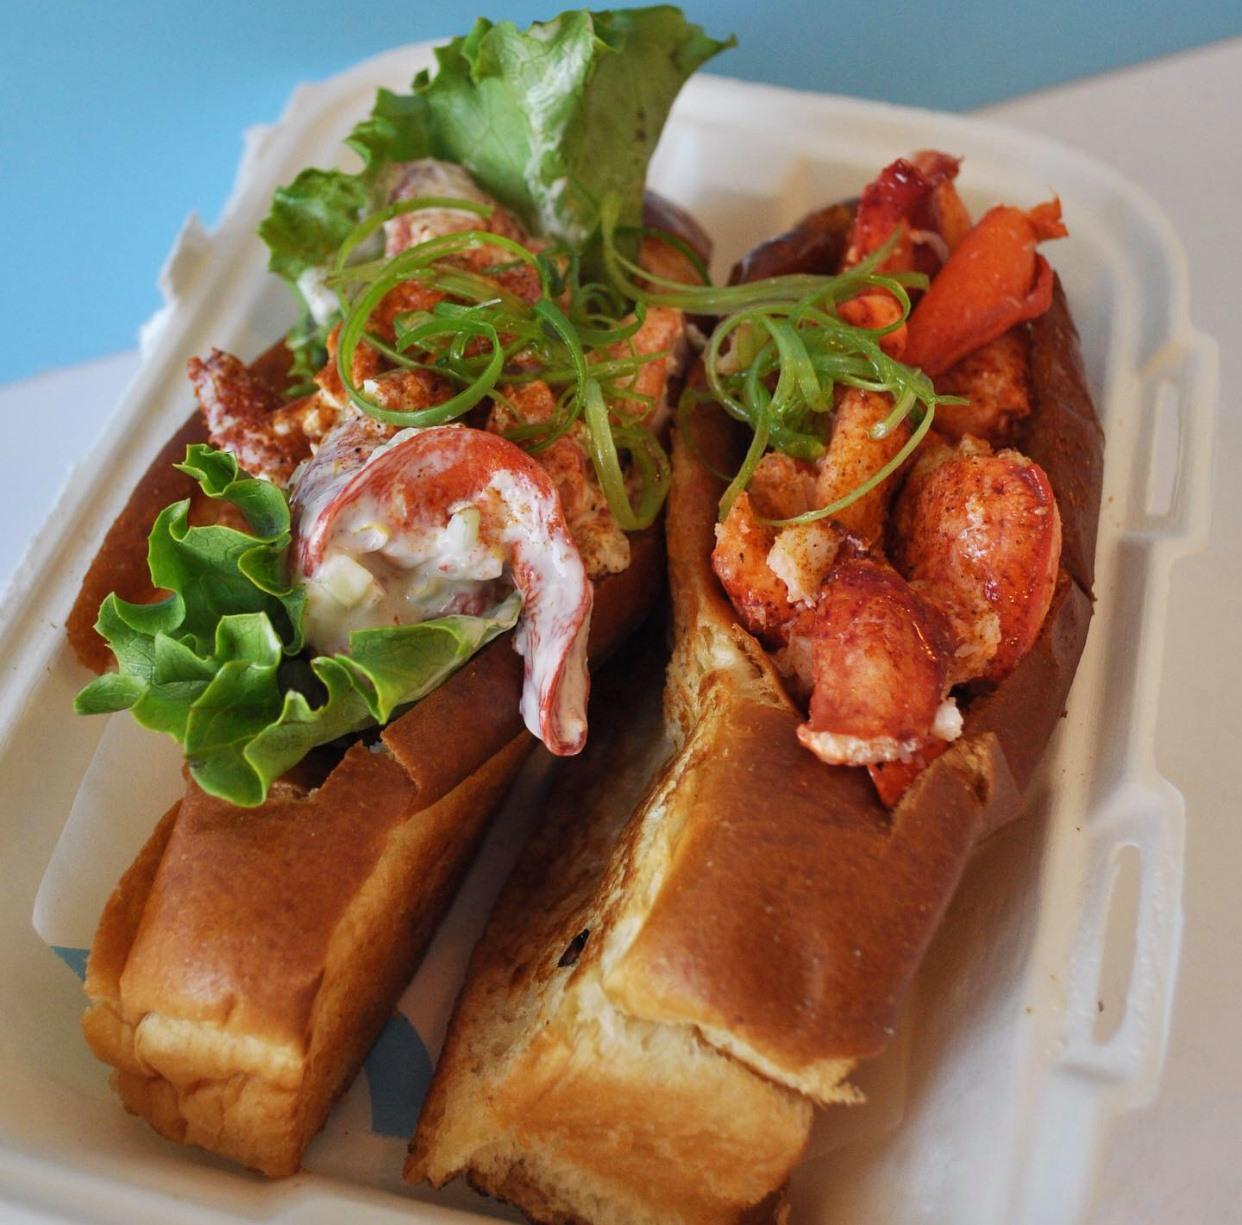 Lobster rolls from Garbo's